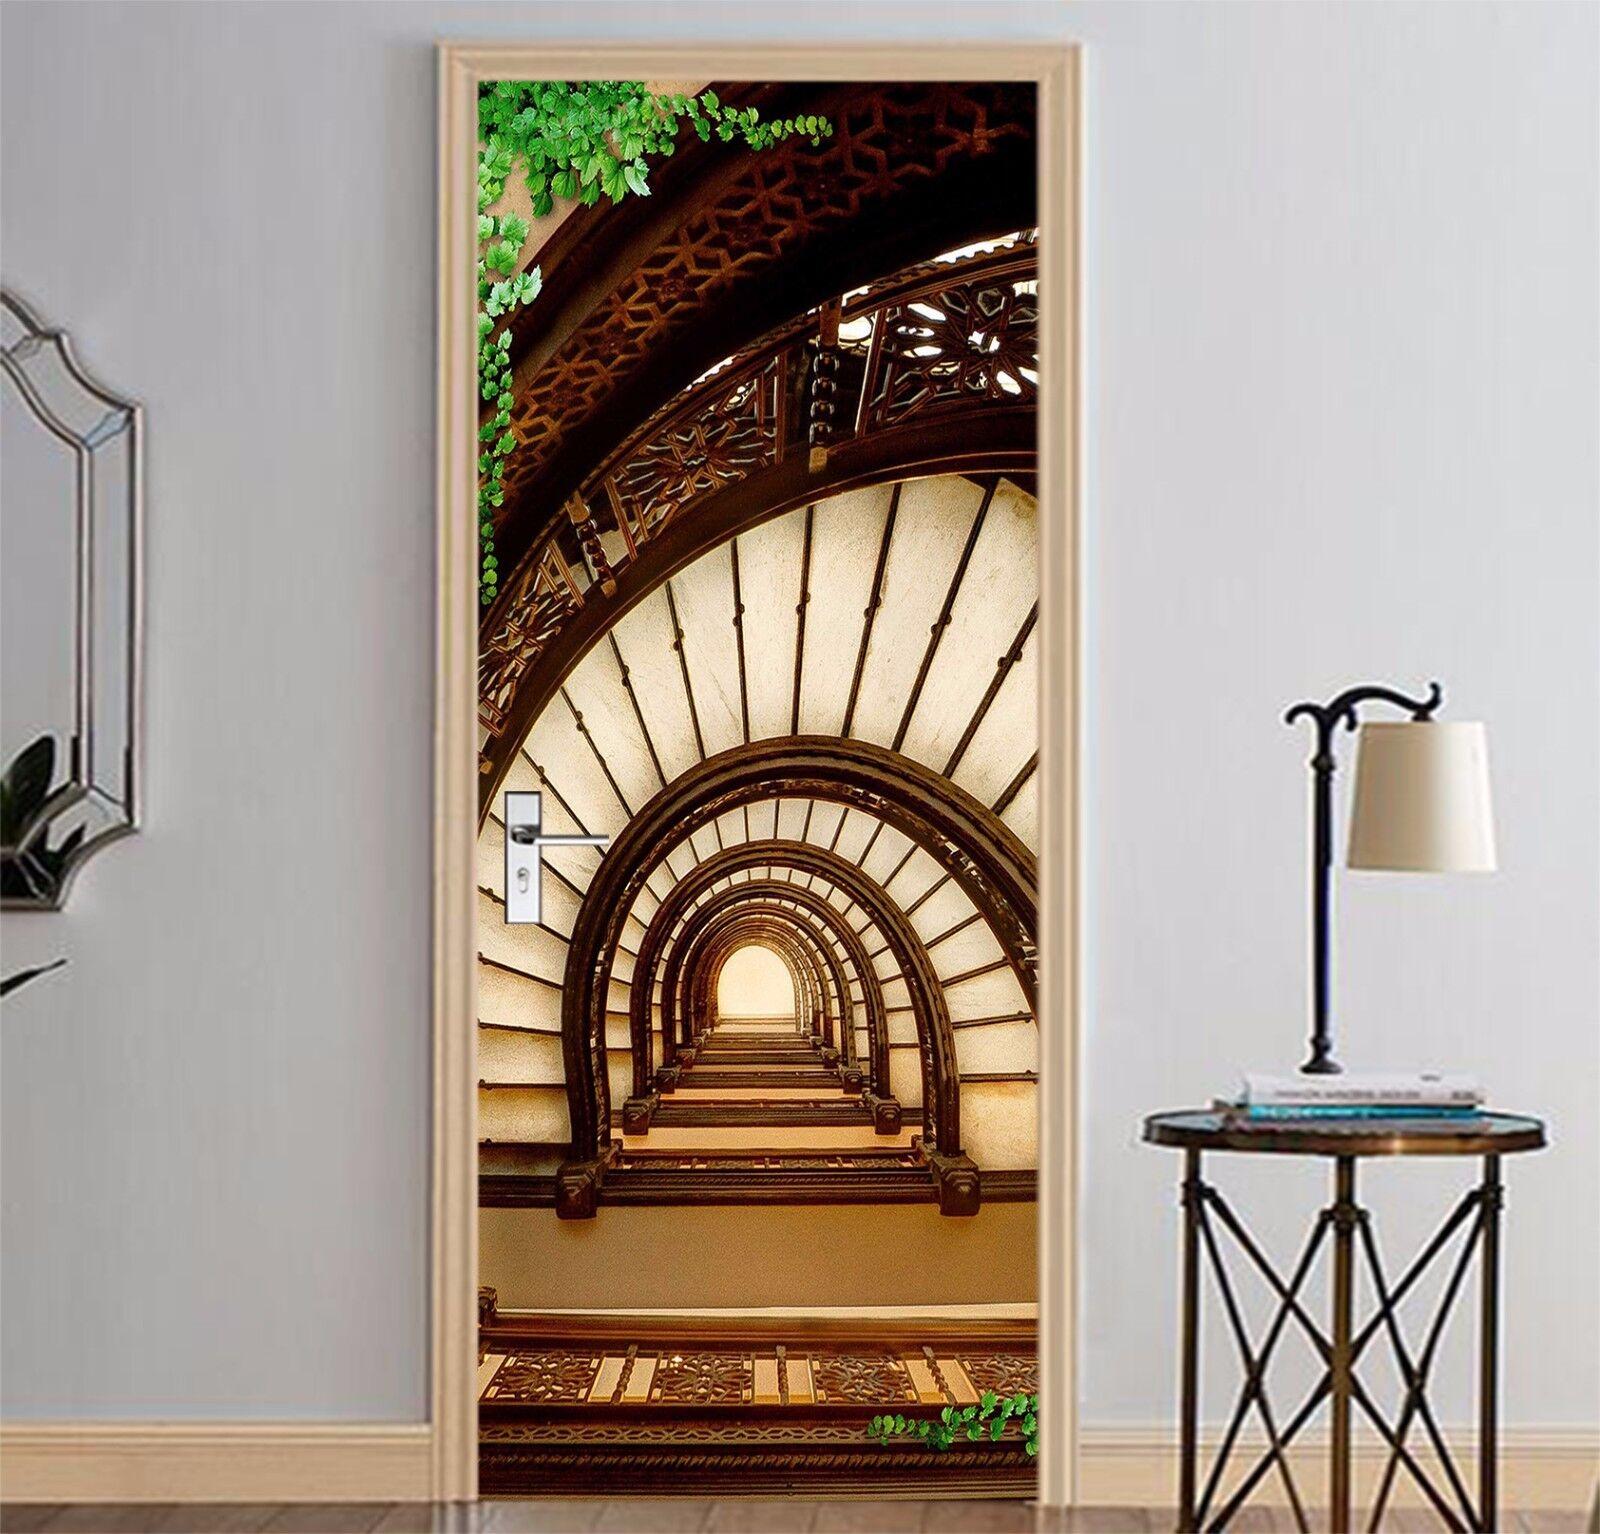 3D Bogen 89 Tür Wandmalerei Wandaufkleber Aufkleber AJ WALLPAPER DE Kyra | Haltbarkeit  | Meistverkaufte weltweit  | Elegant